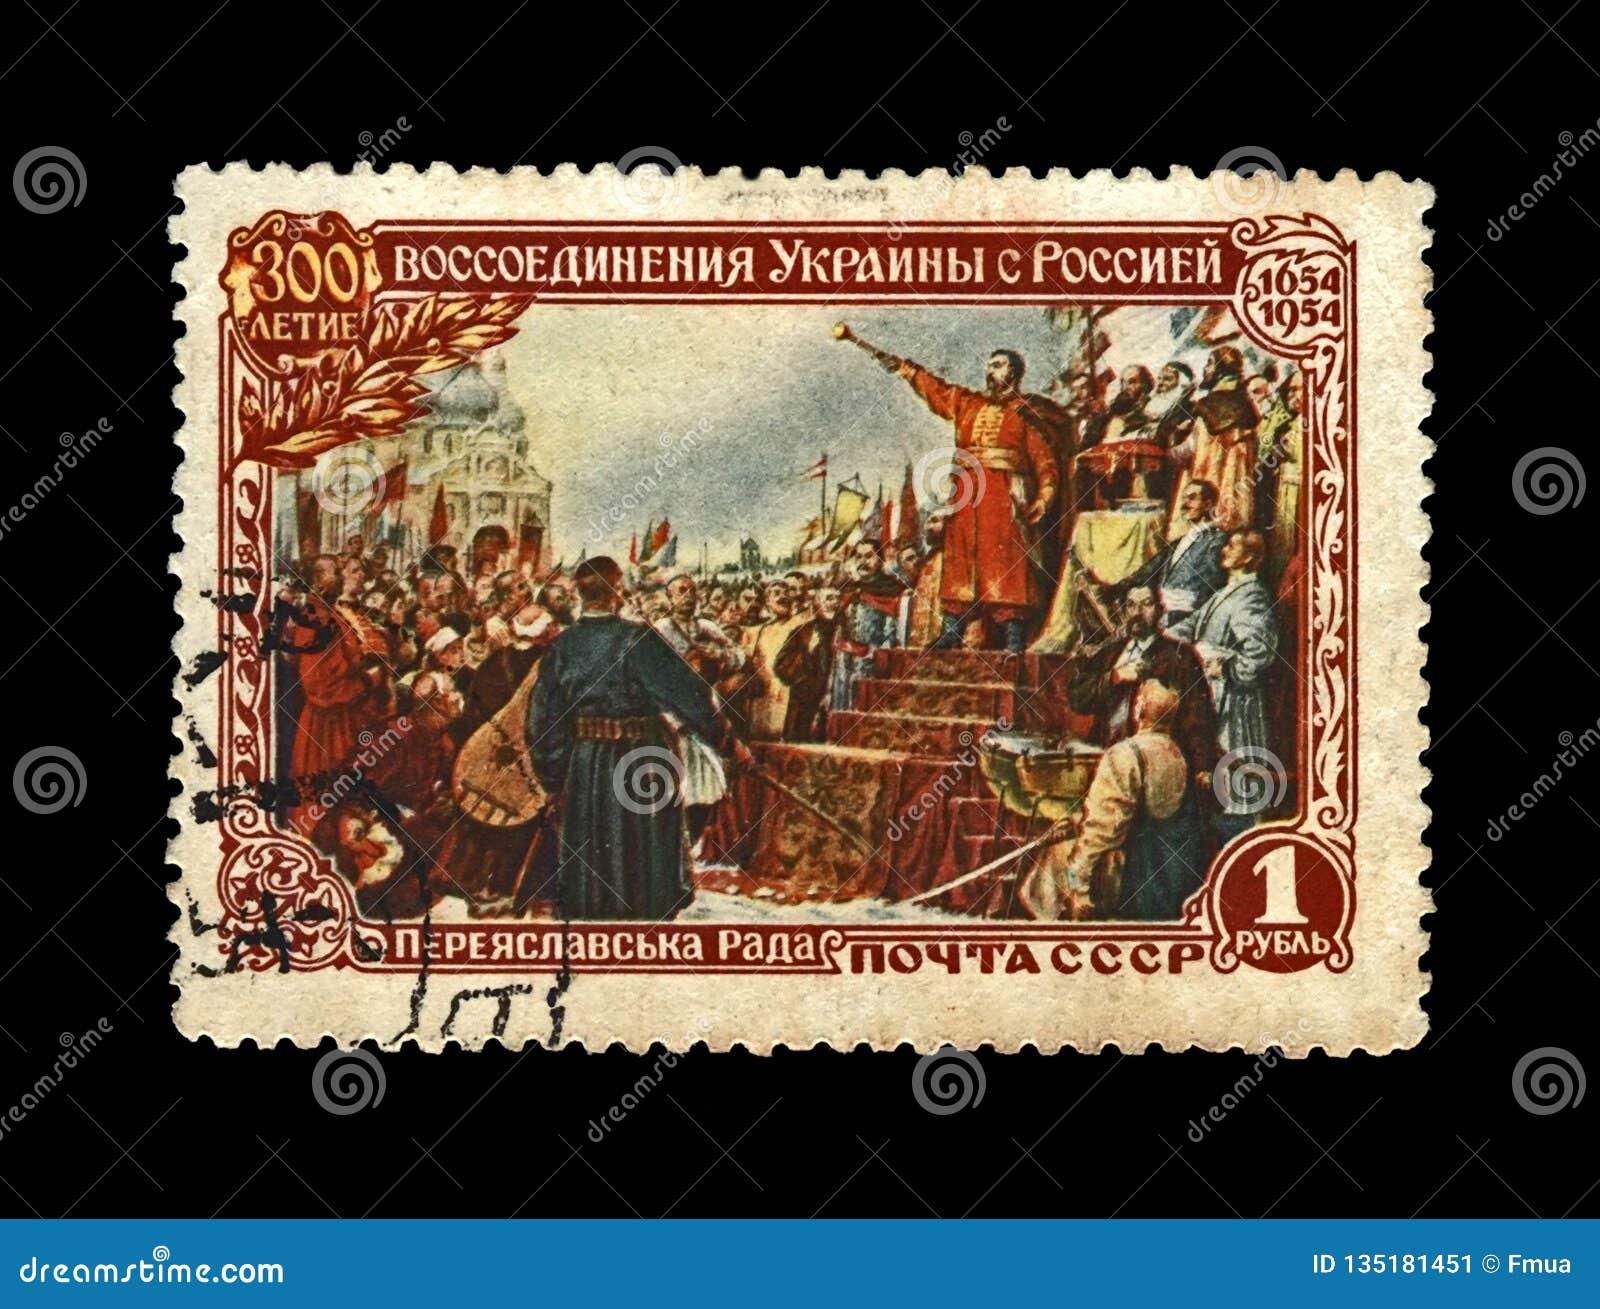 Hetman Bogdan Khmelnitsky proclaming reunion of Ukraine and Russia during Pereyaslav Council in 1654, USSR, circa 1954.